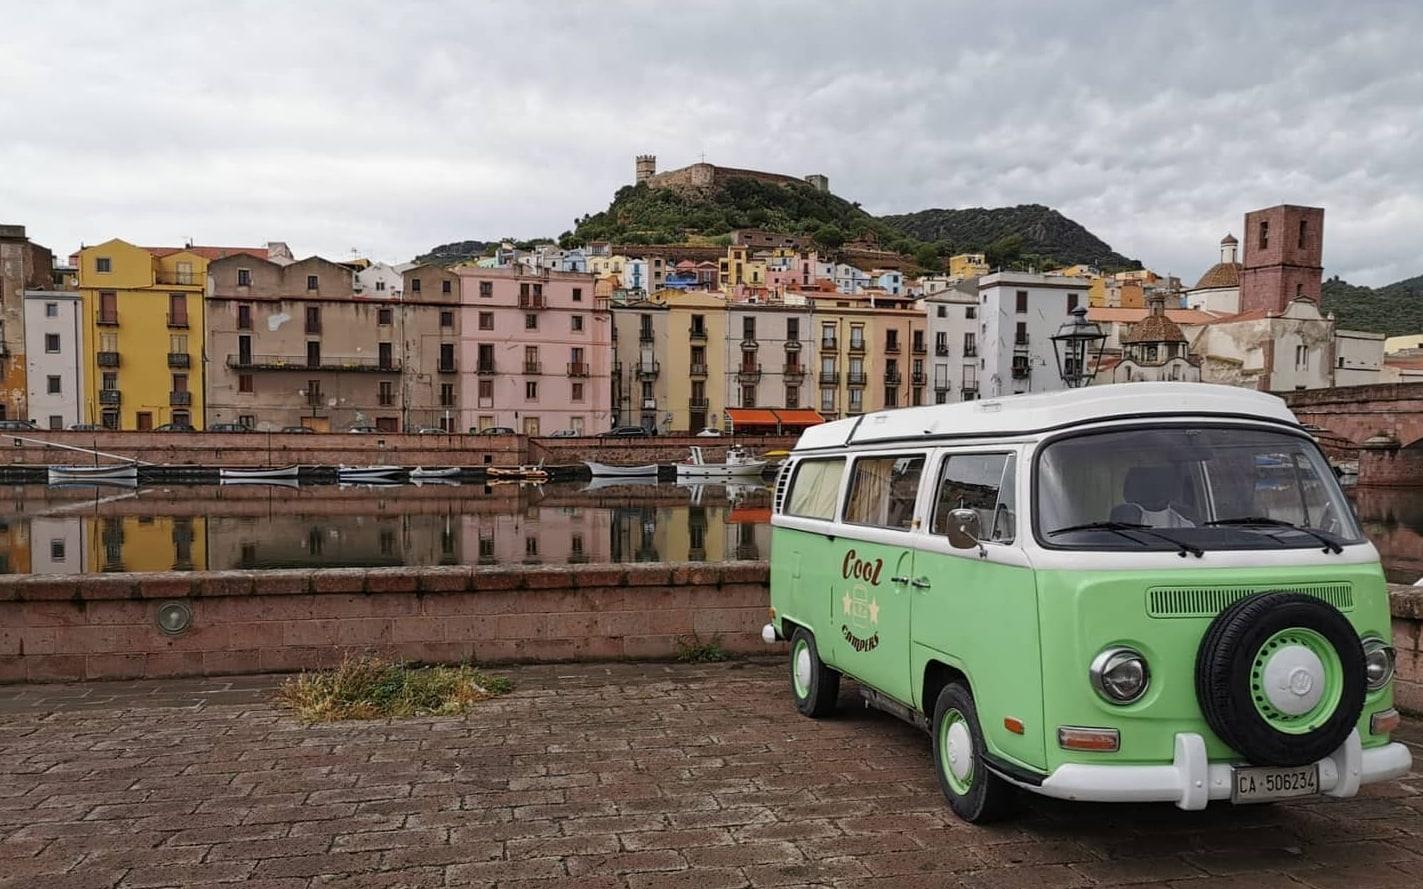 Uno dei mezzi storici di Cool Campers, in Sardegna